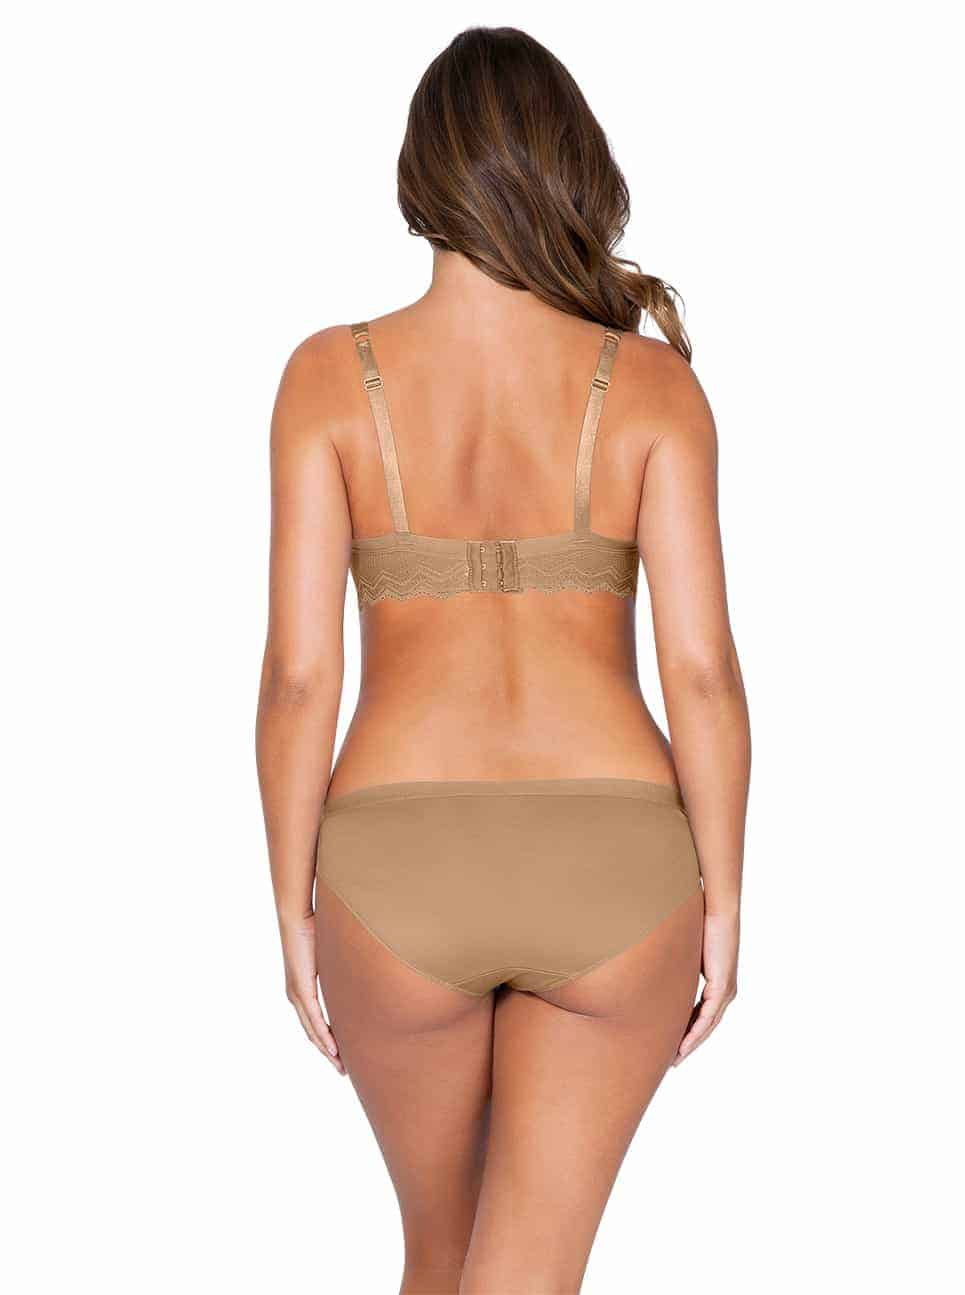 Lydie P5441ContourPadded P5443 Bikini NudeBack copy - Lydie Contour Padded Bra – European Nude – P5441